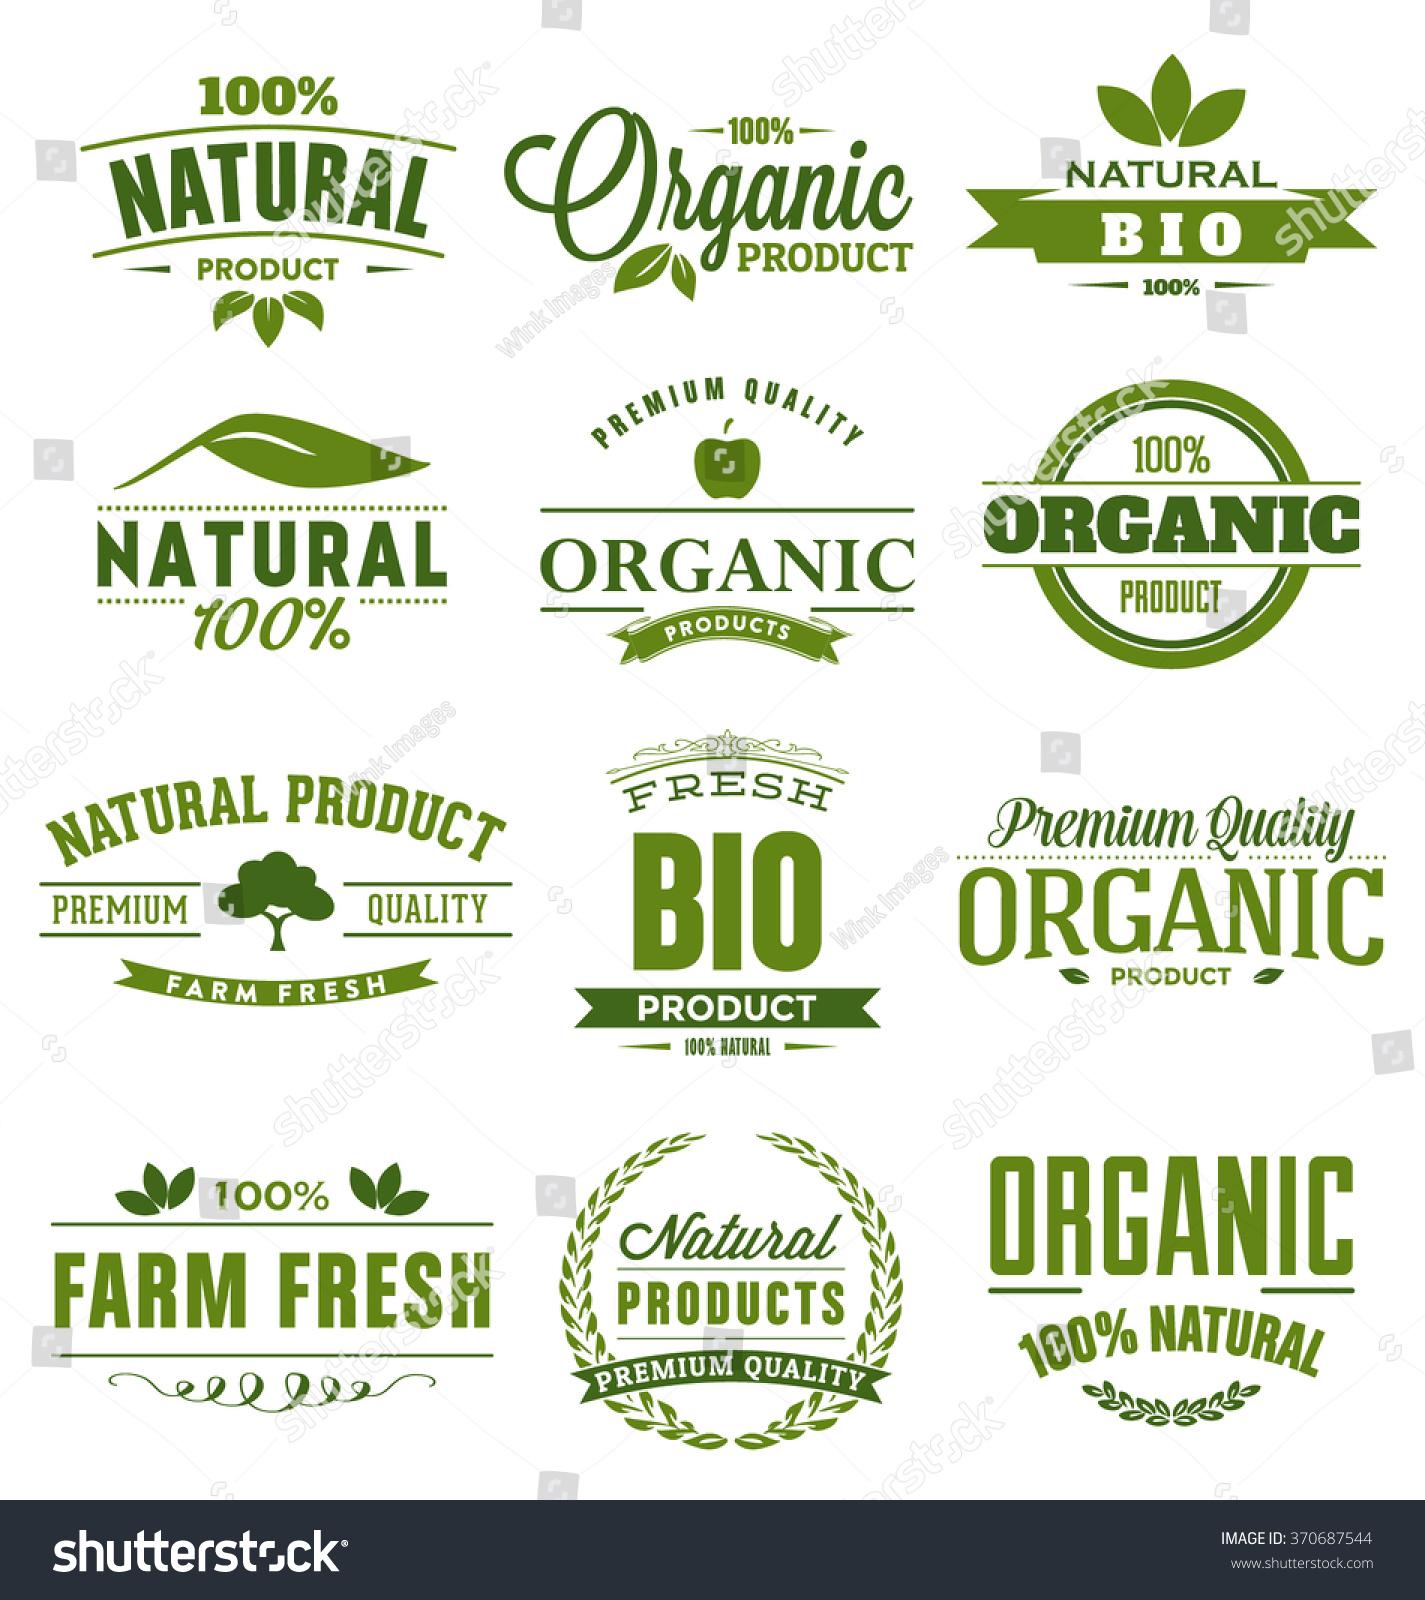 Natural organic bio farm fresh design stock vector for Fresh design